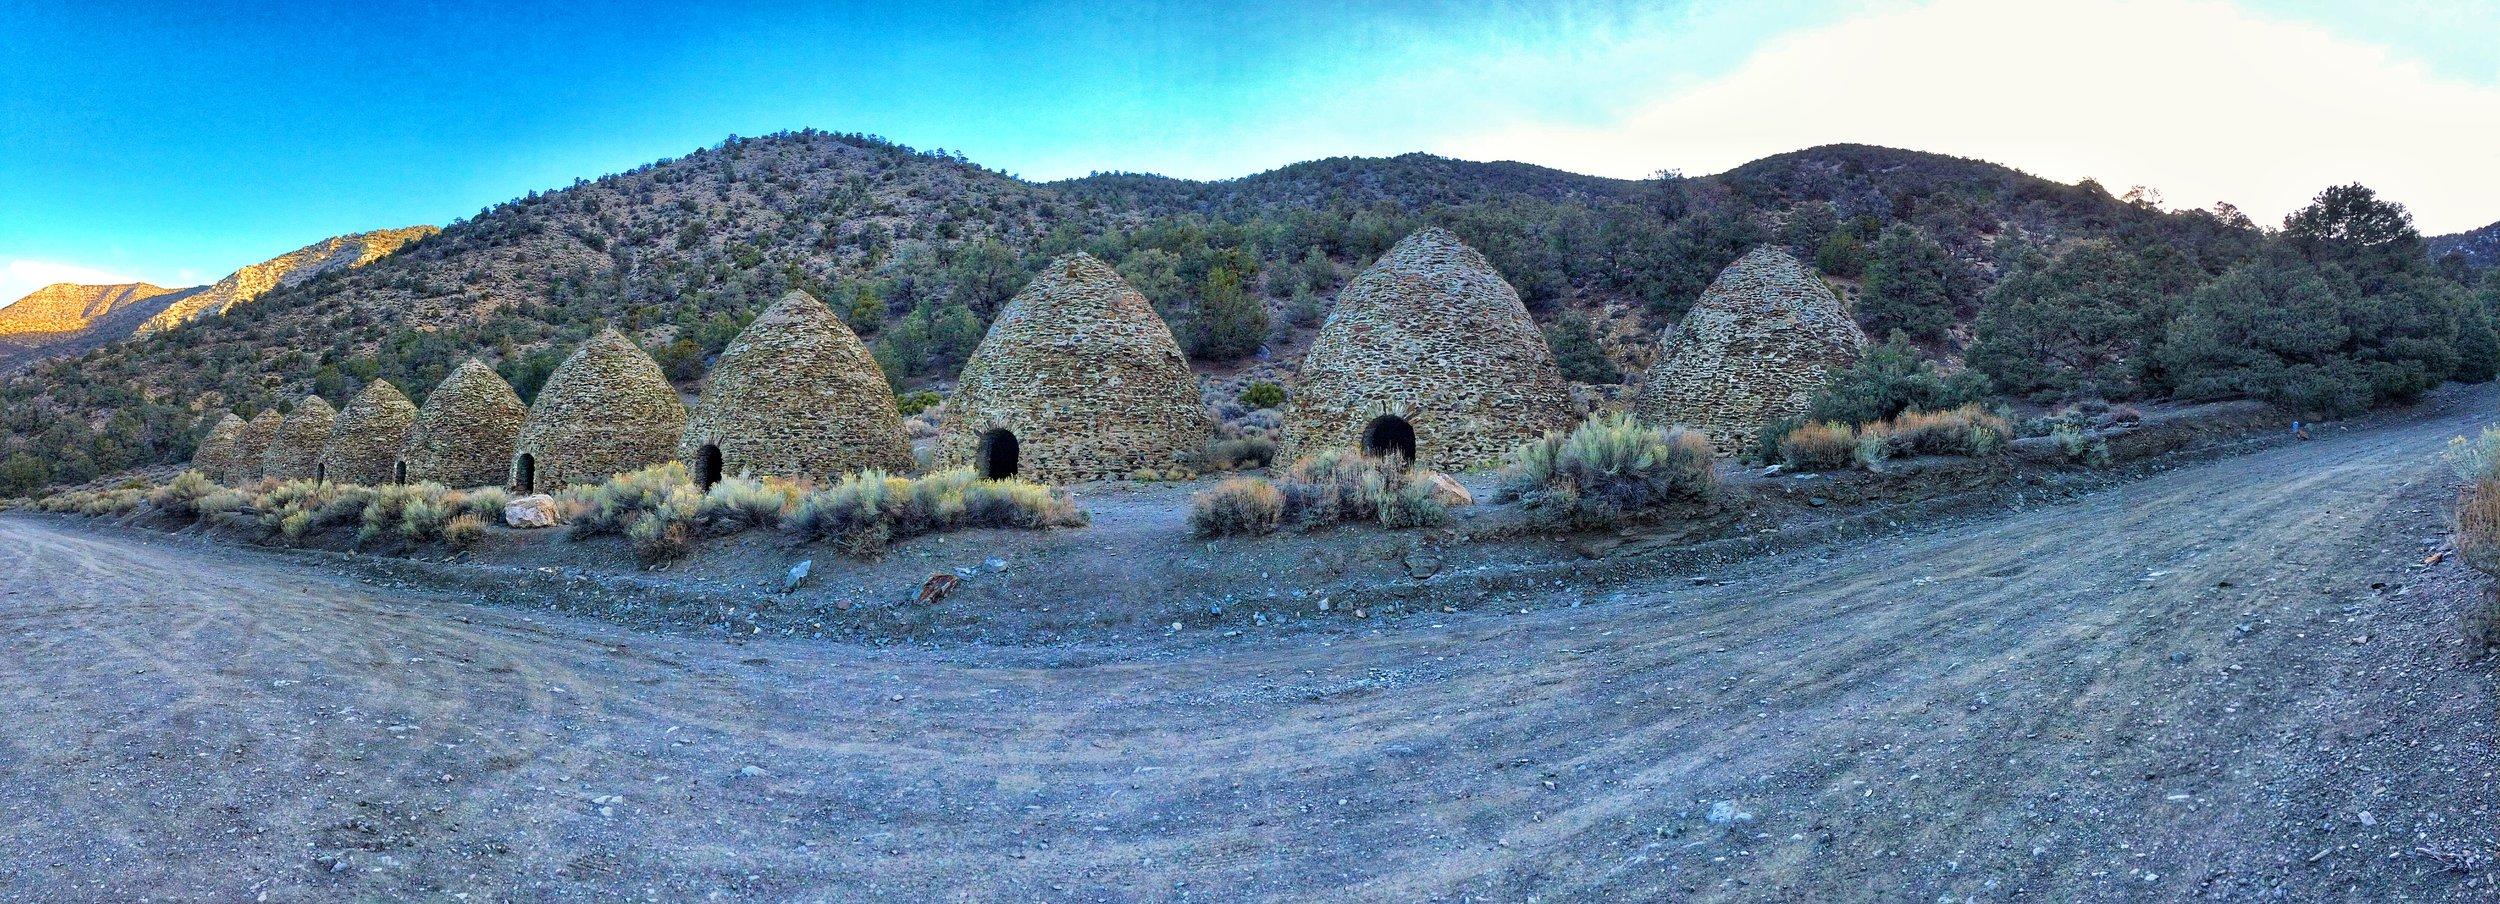 Charcoal Kilns, Death Valley